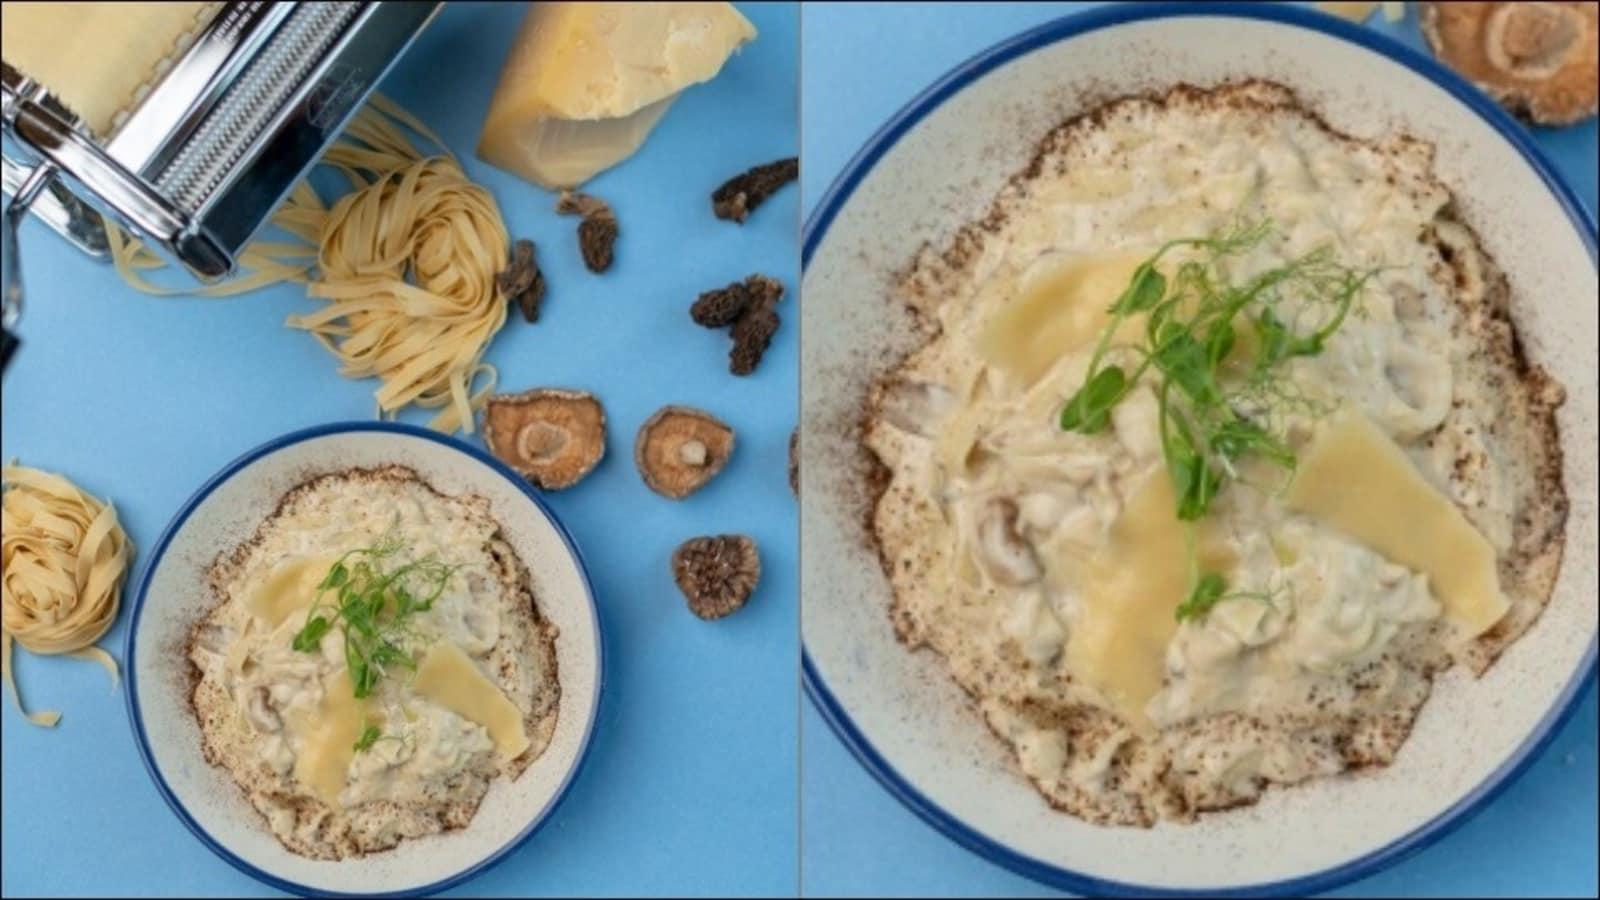 Recipe: Wrap up Monday night with umami goodness of wild mushroom risotto